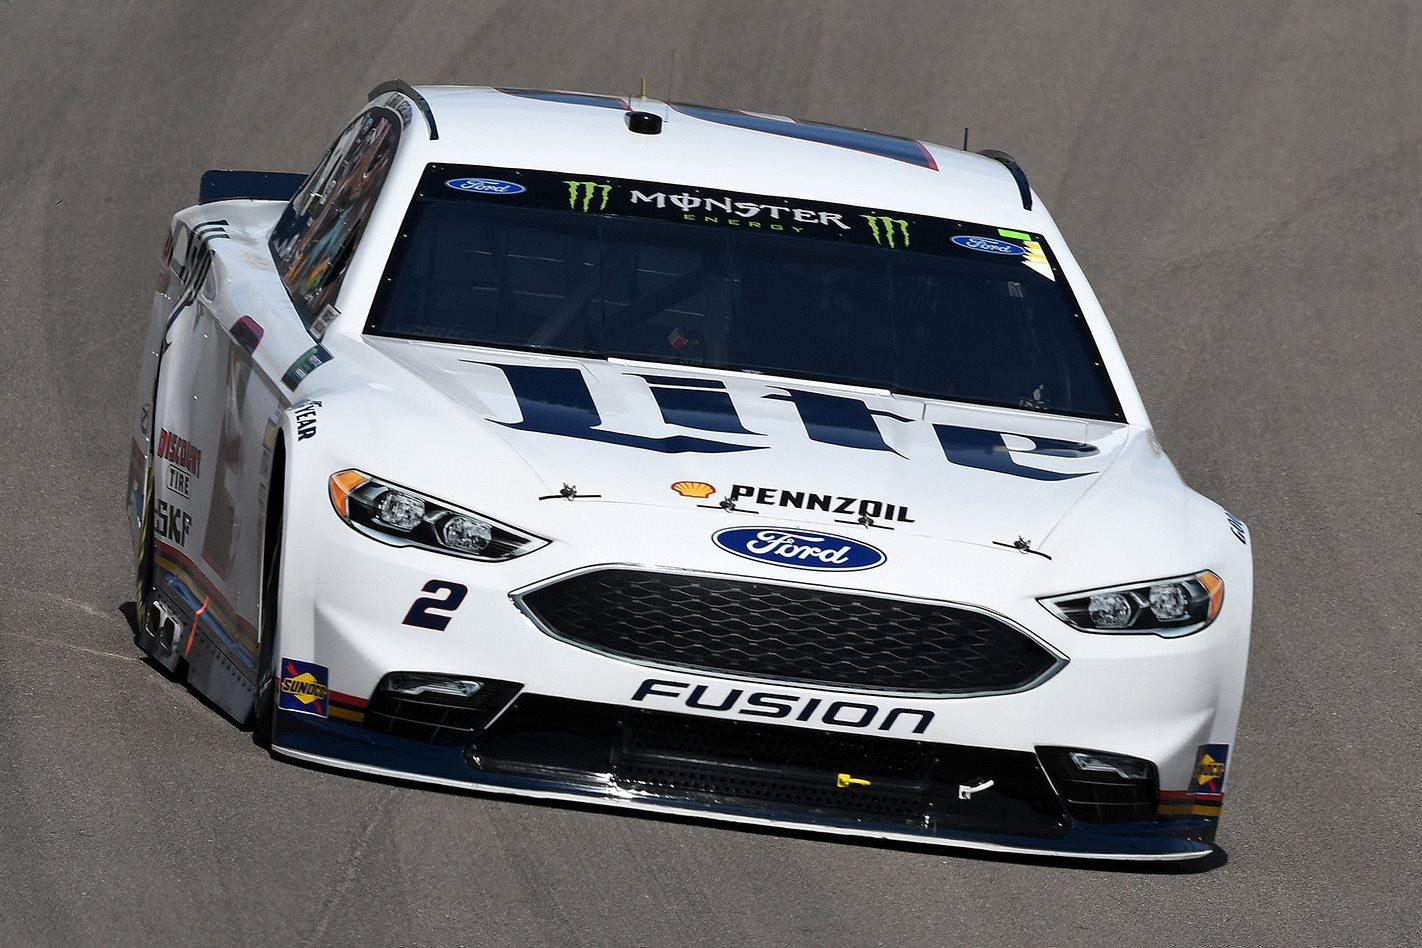 DJR Team Penske NASCAR Ford Fusion